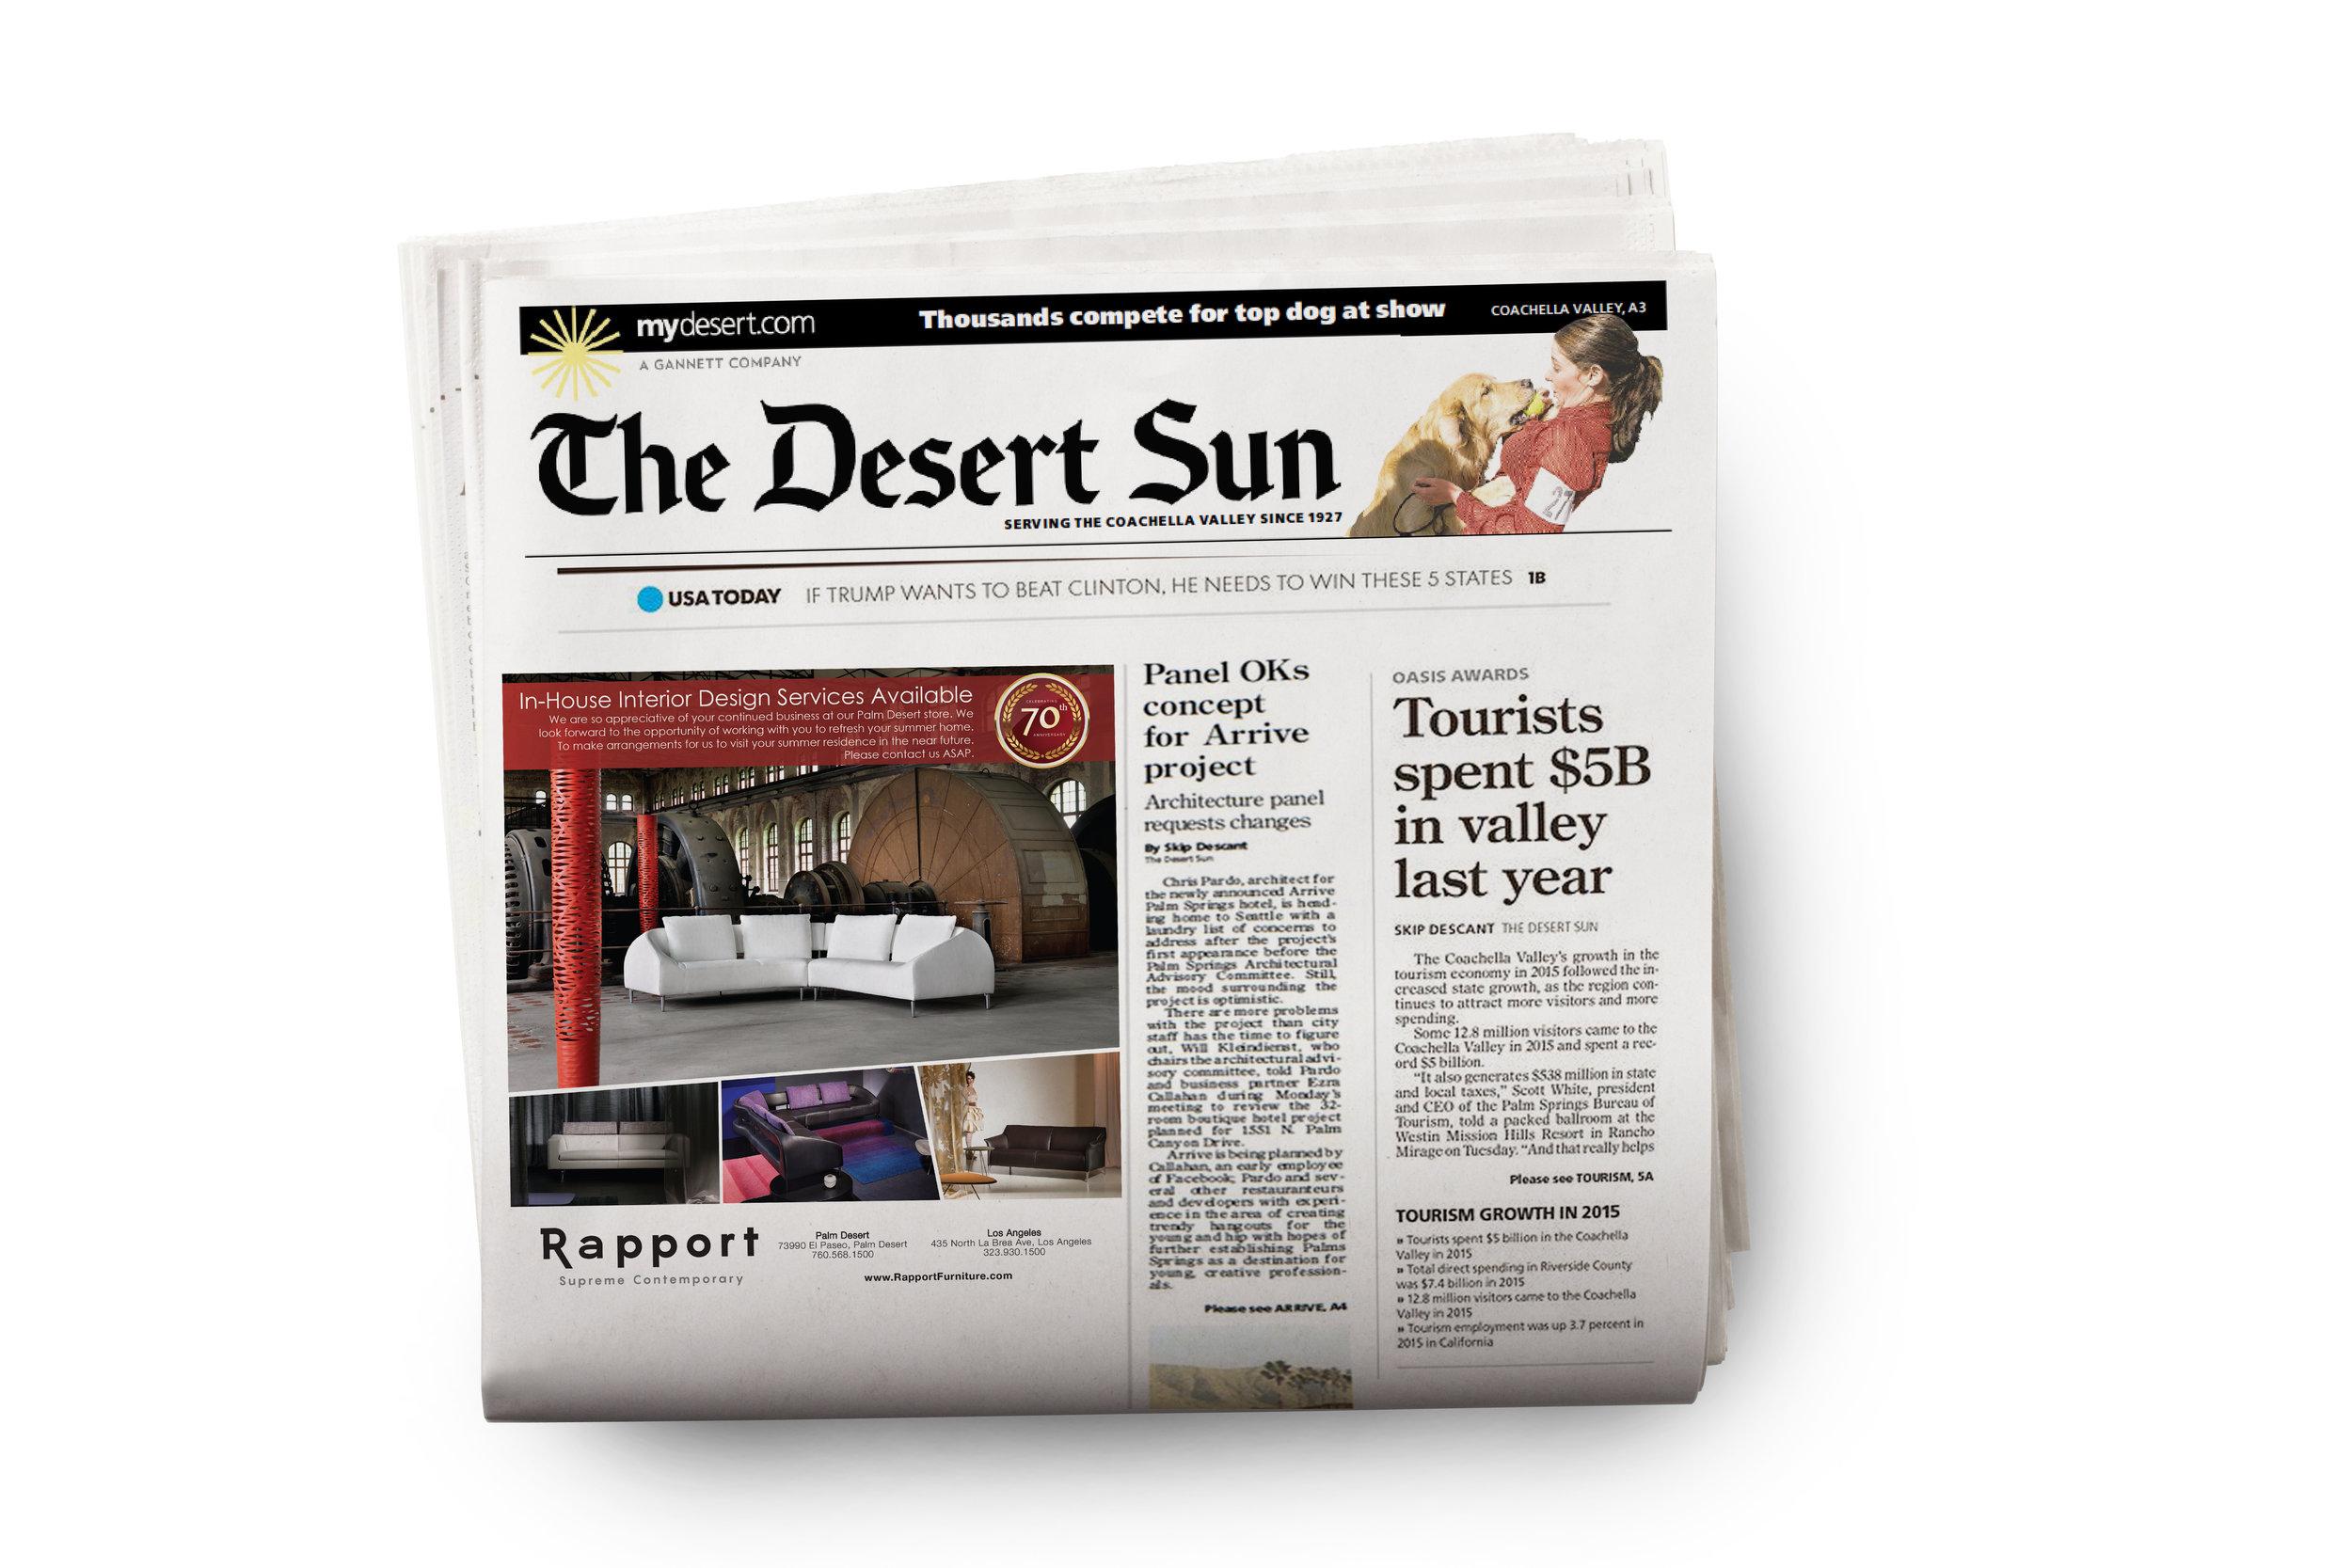 Rapport_DesertSunNewspaper_MOCKUP9.jpg